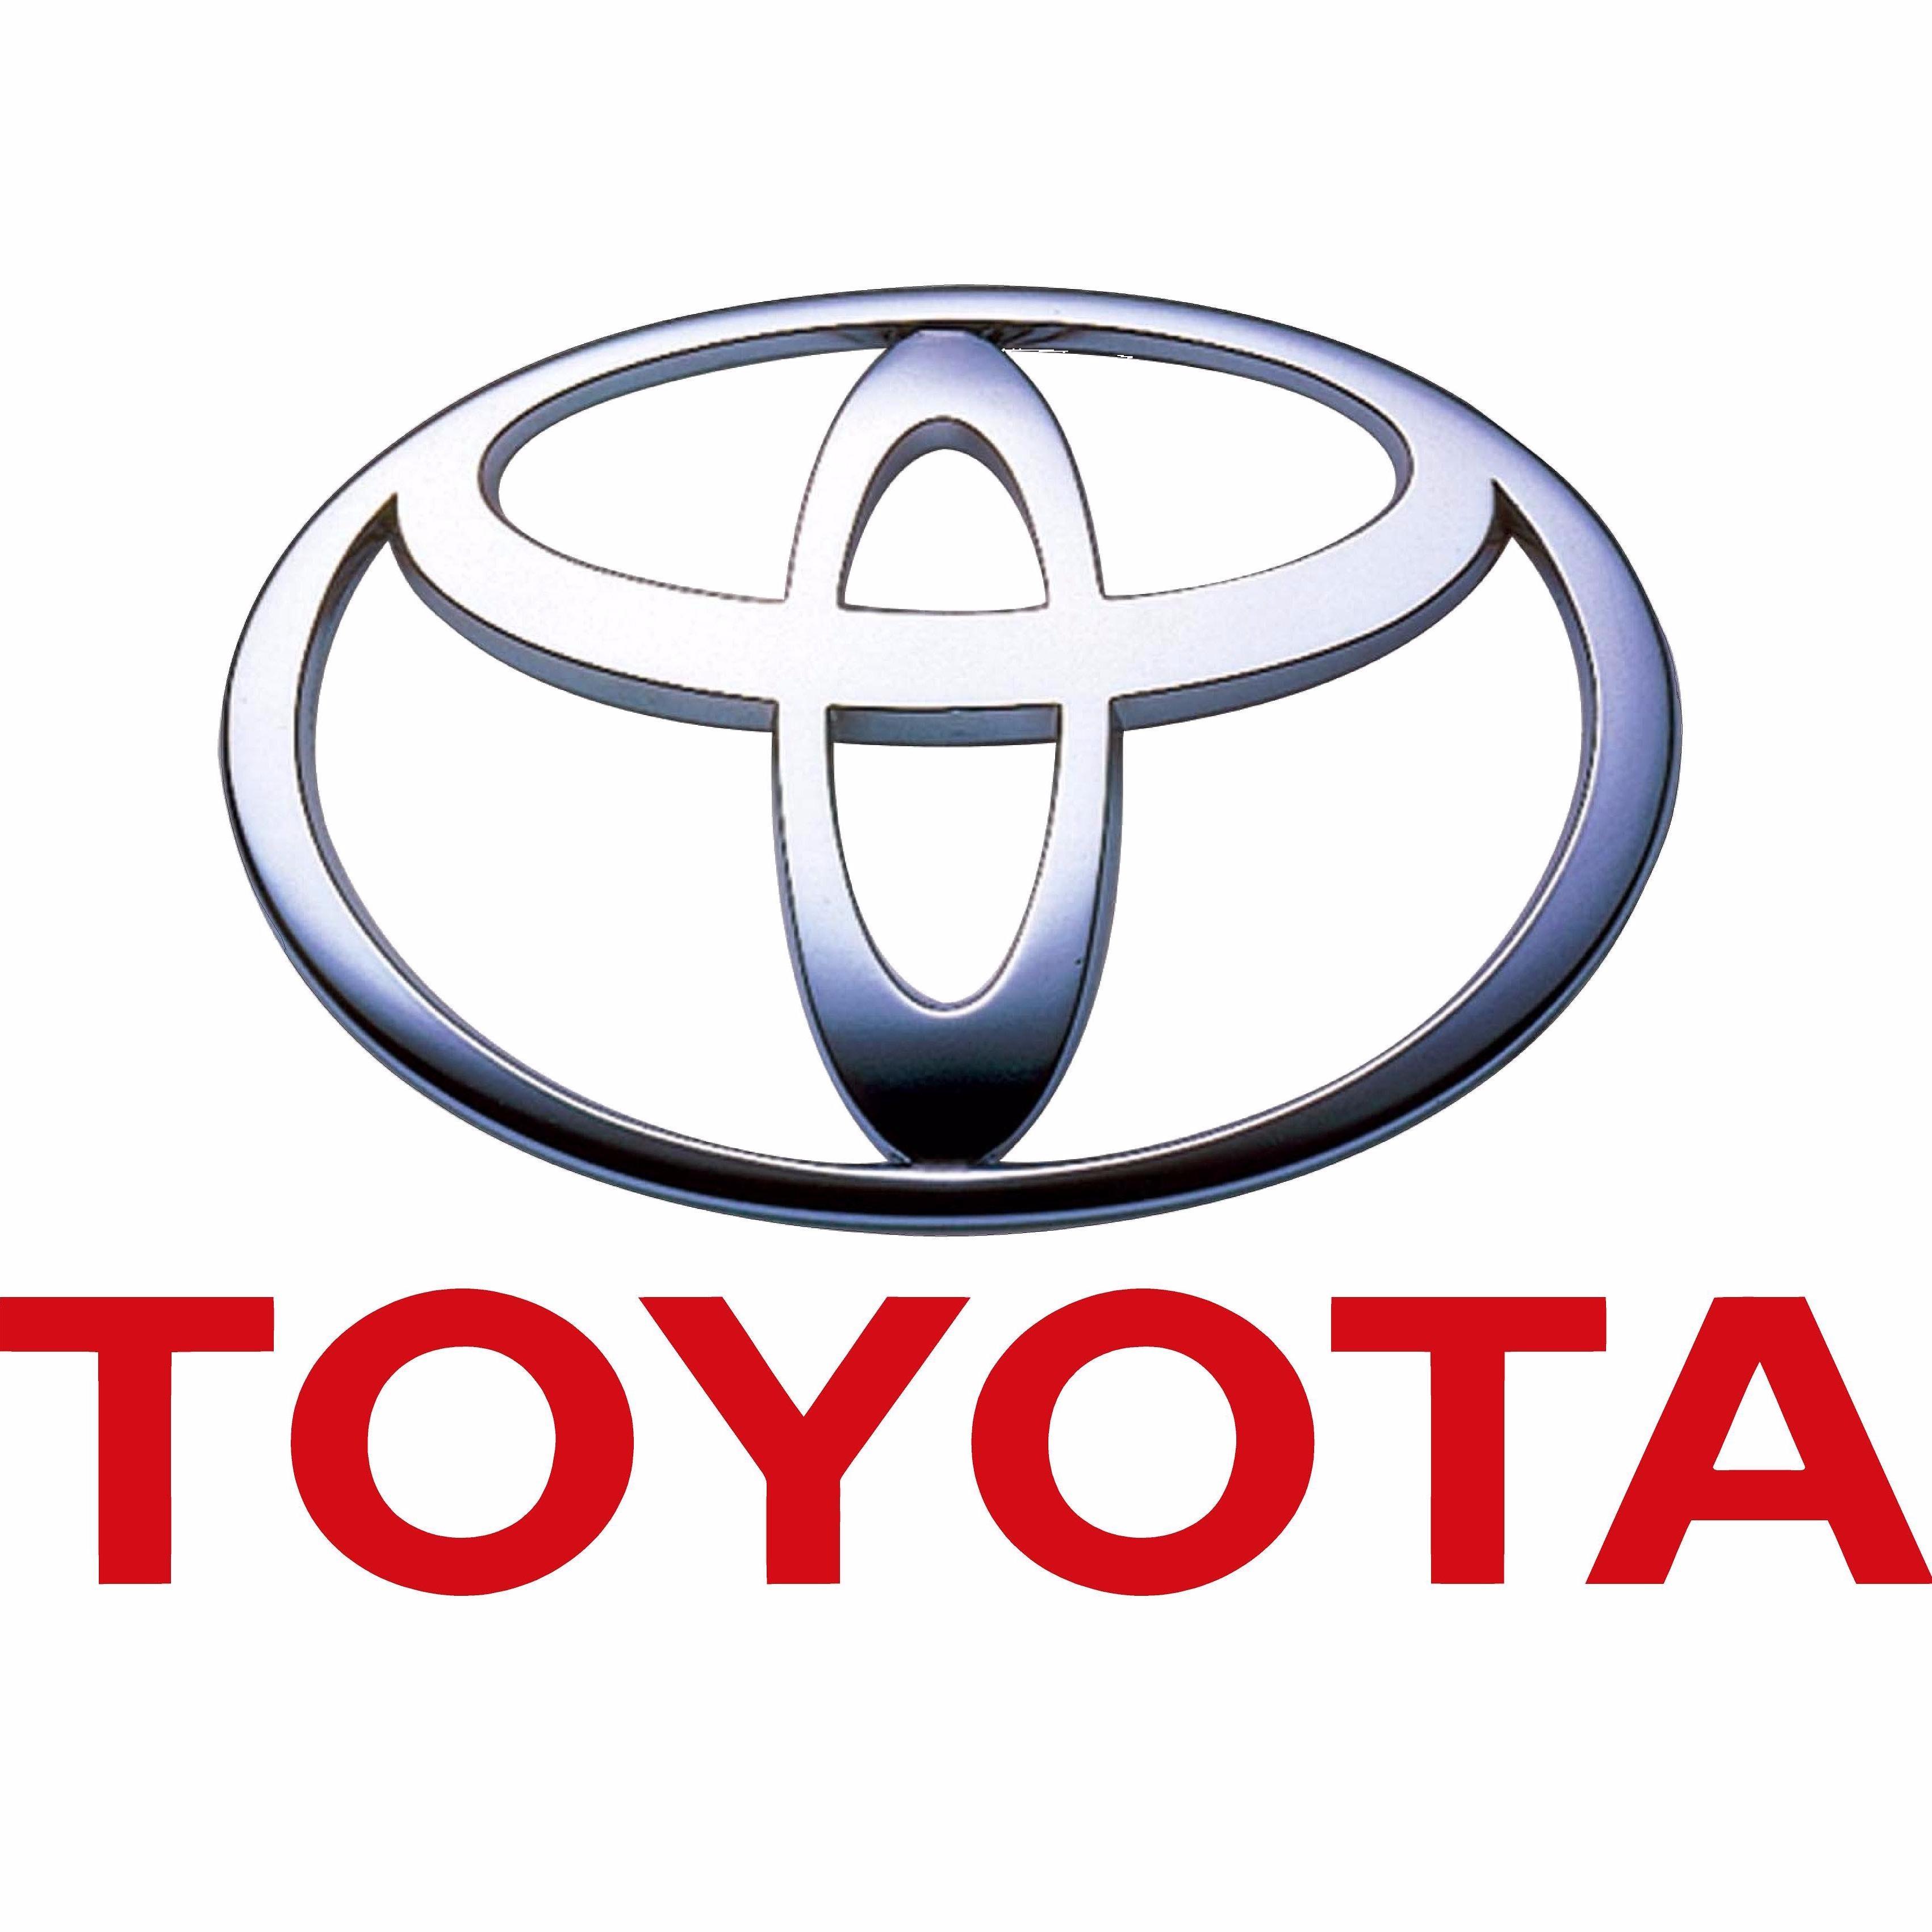 International Toyota